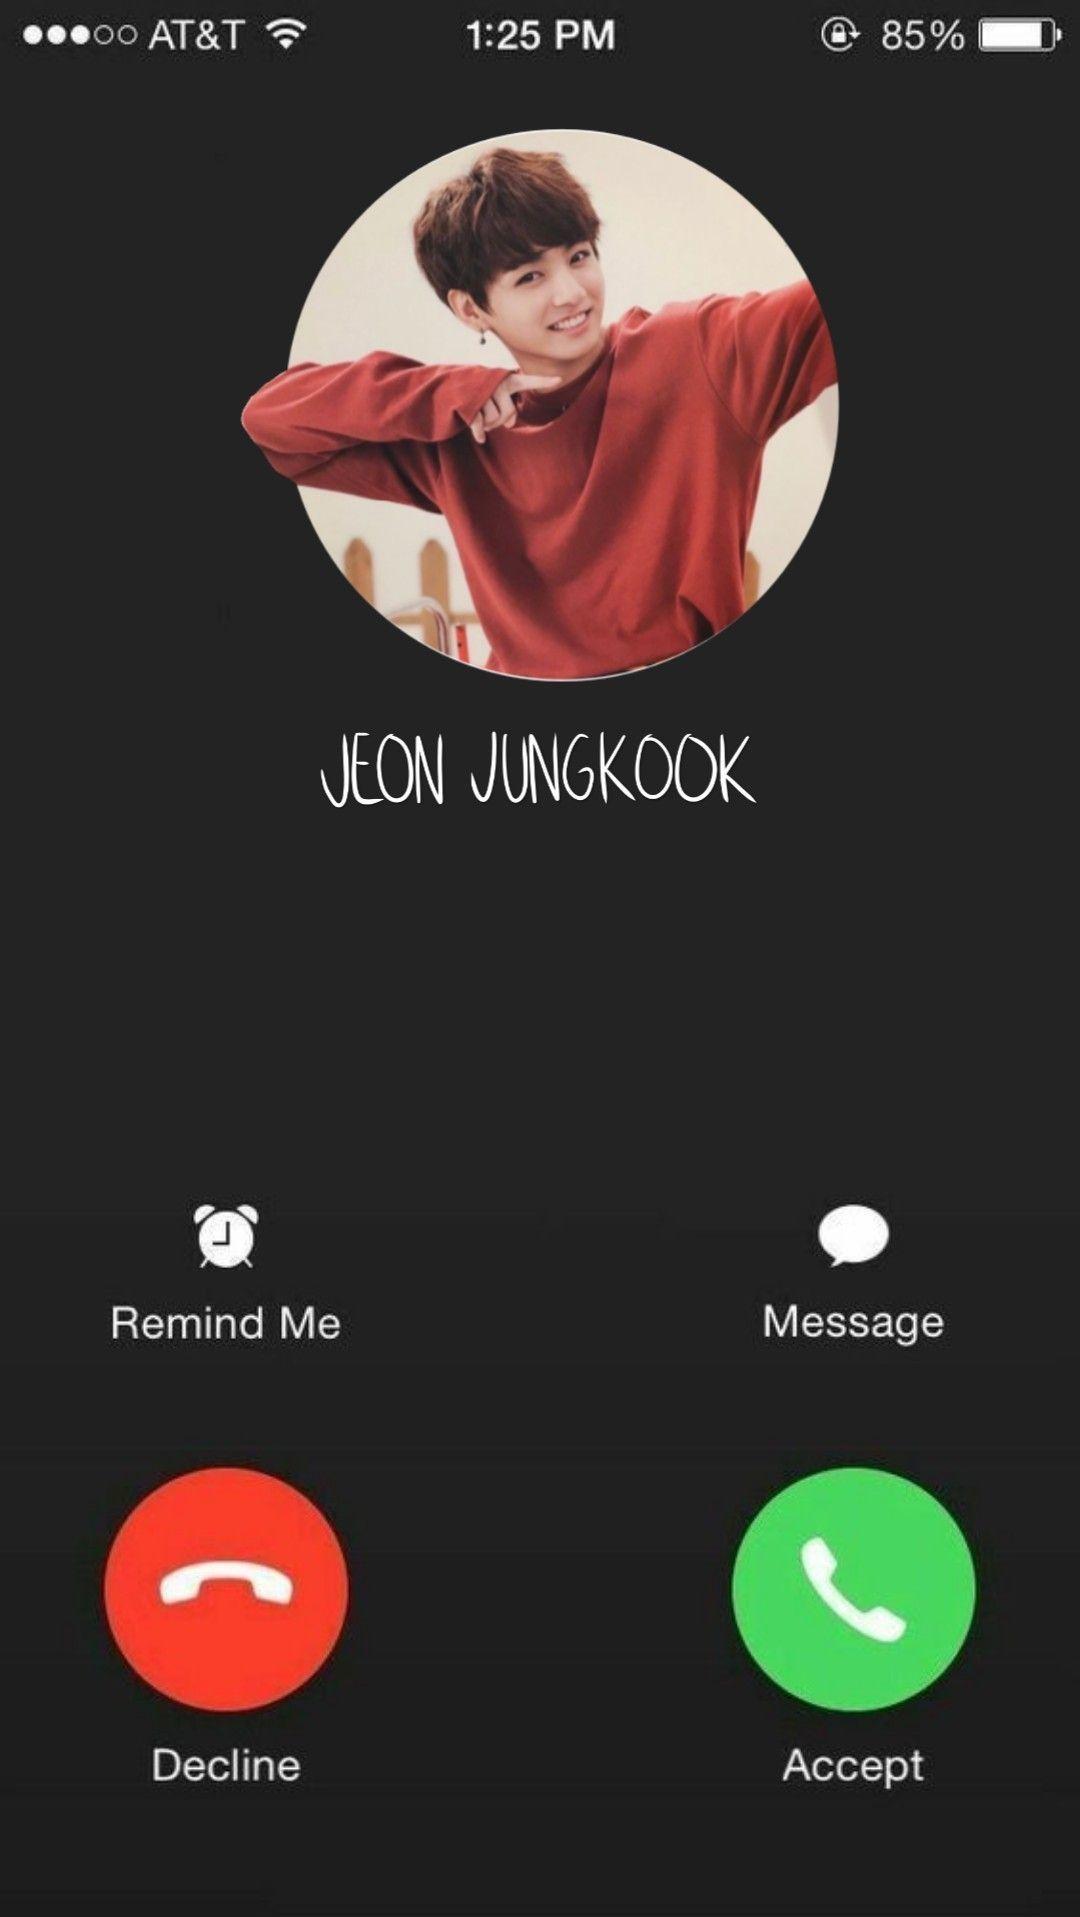 Bts Jungkook Call Wallpaper Bts Call Jungkook Wallpaper Bts Jungkook Jungkook Bts